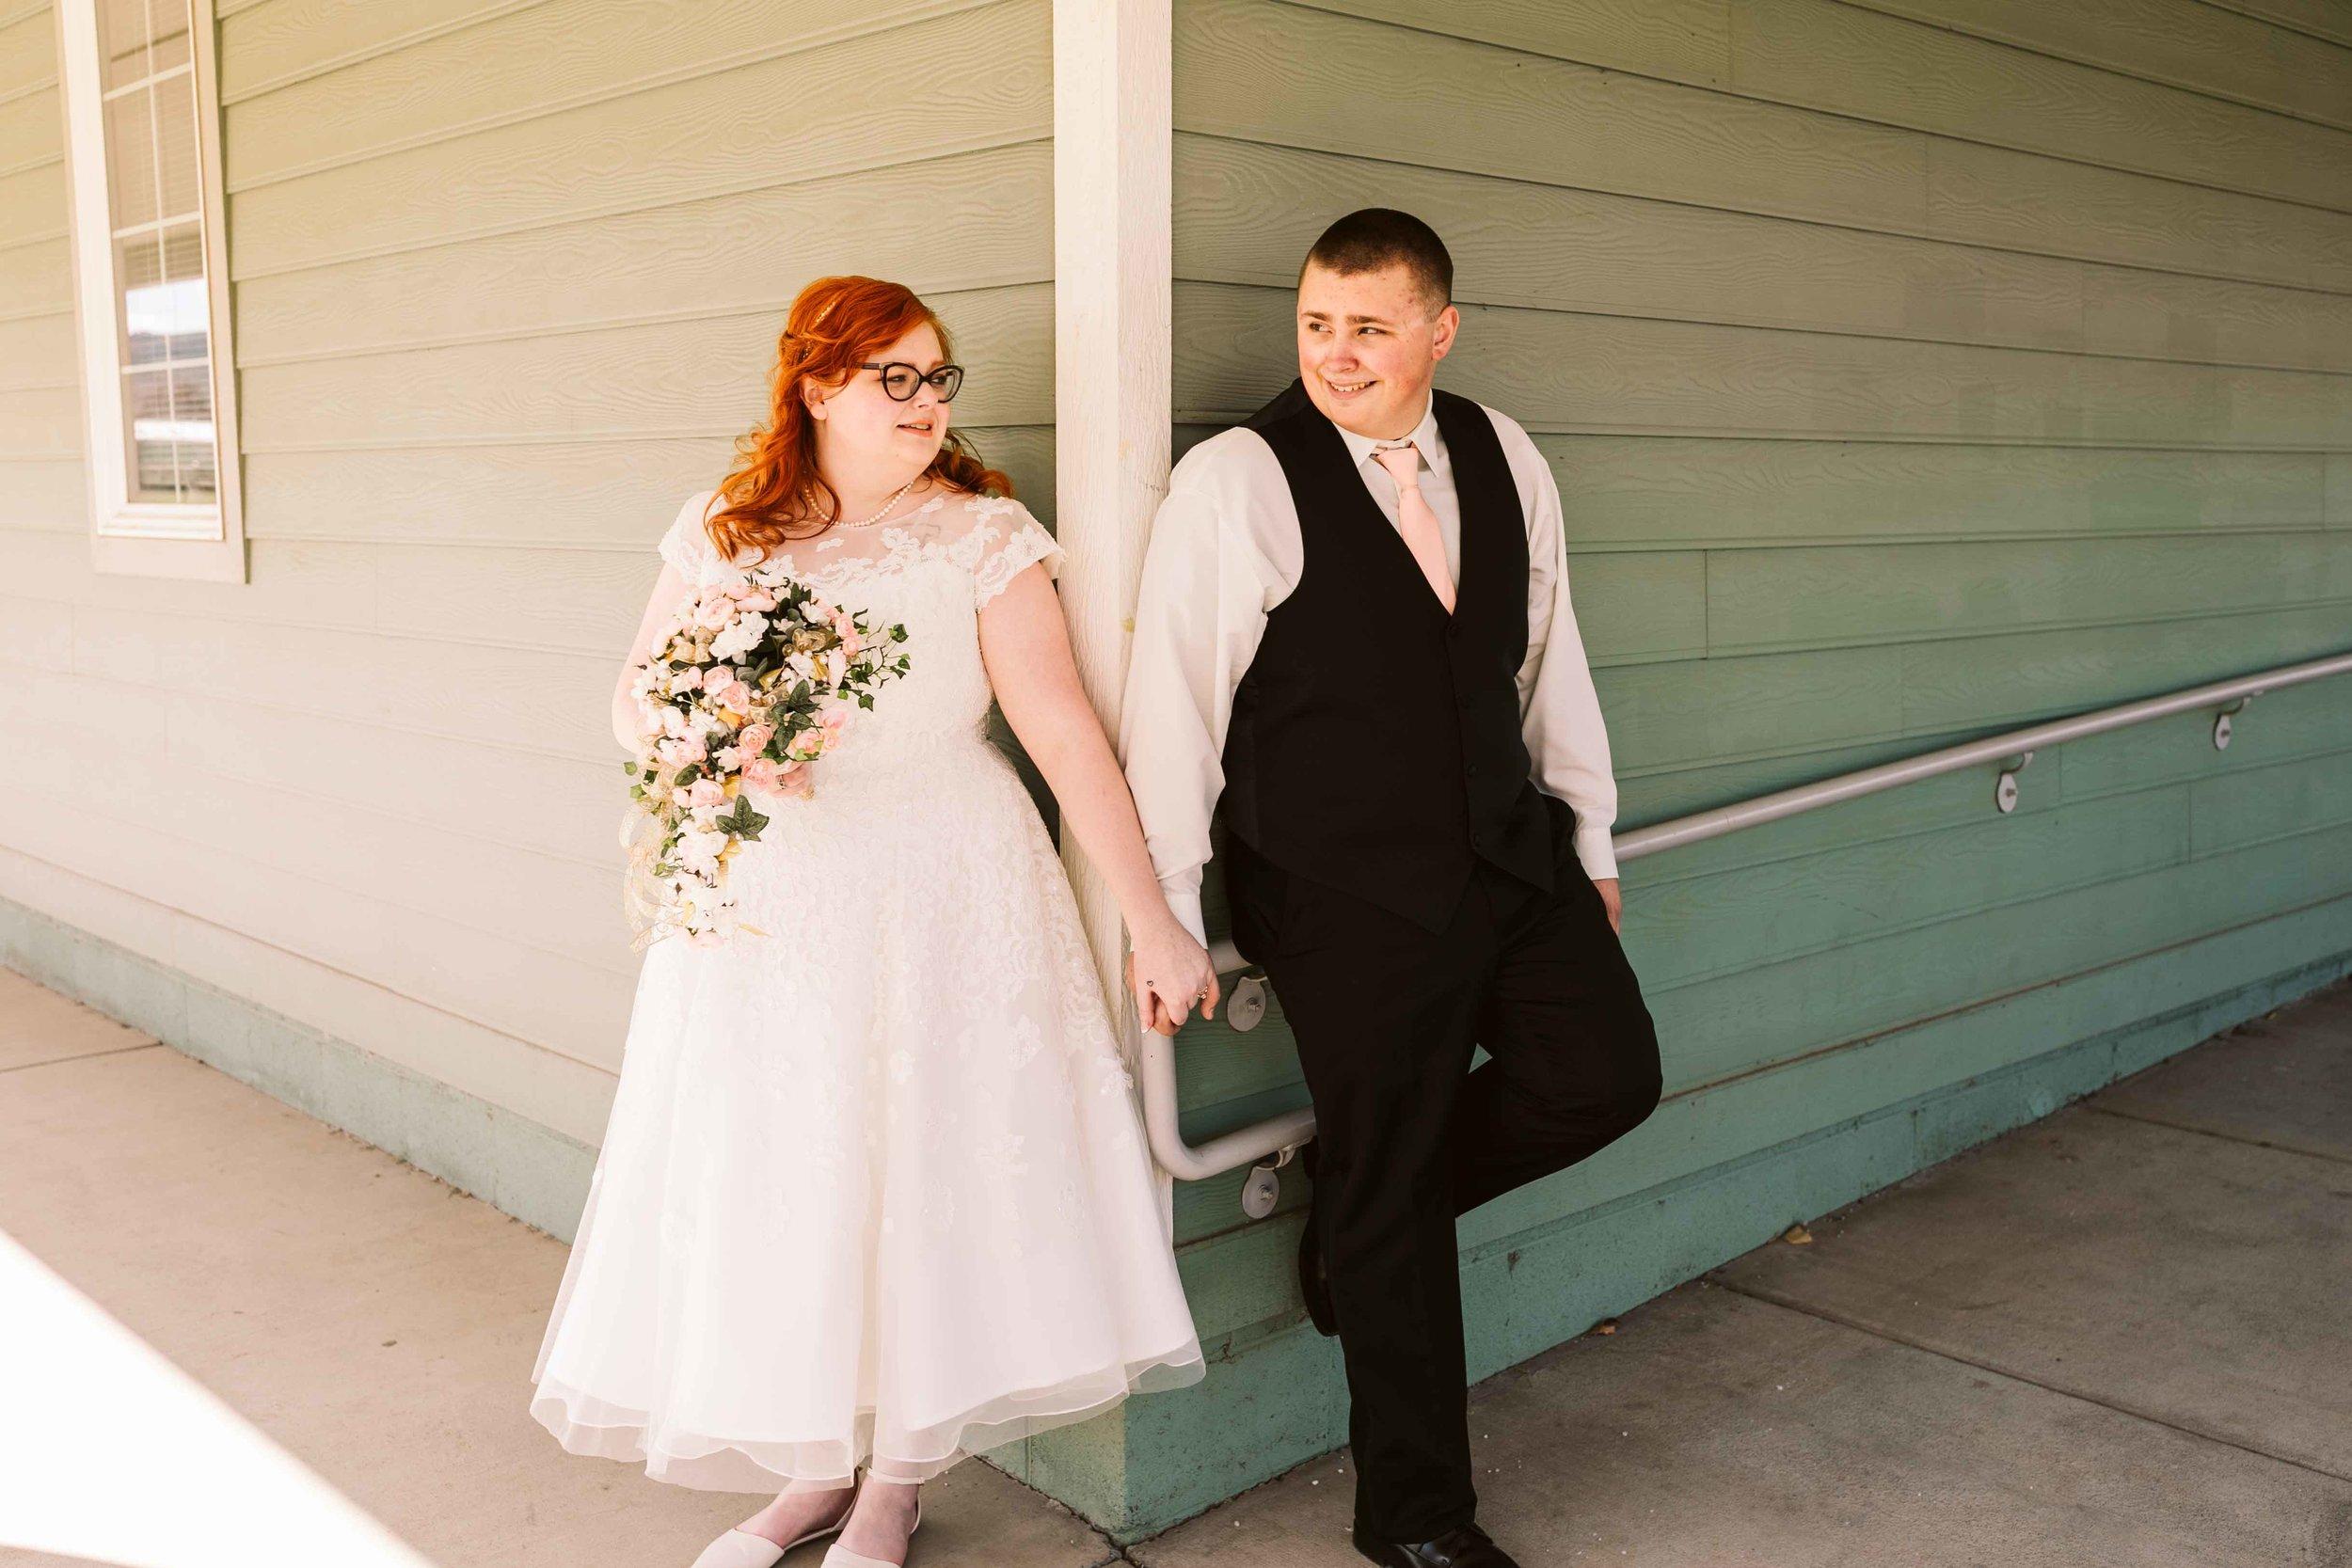 richland-wedding-photographer-52.jpg